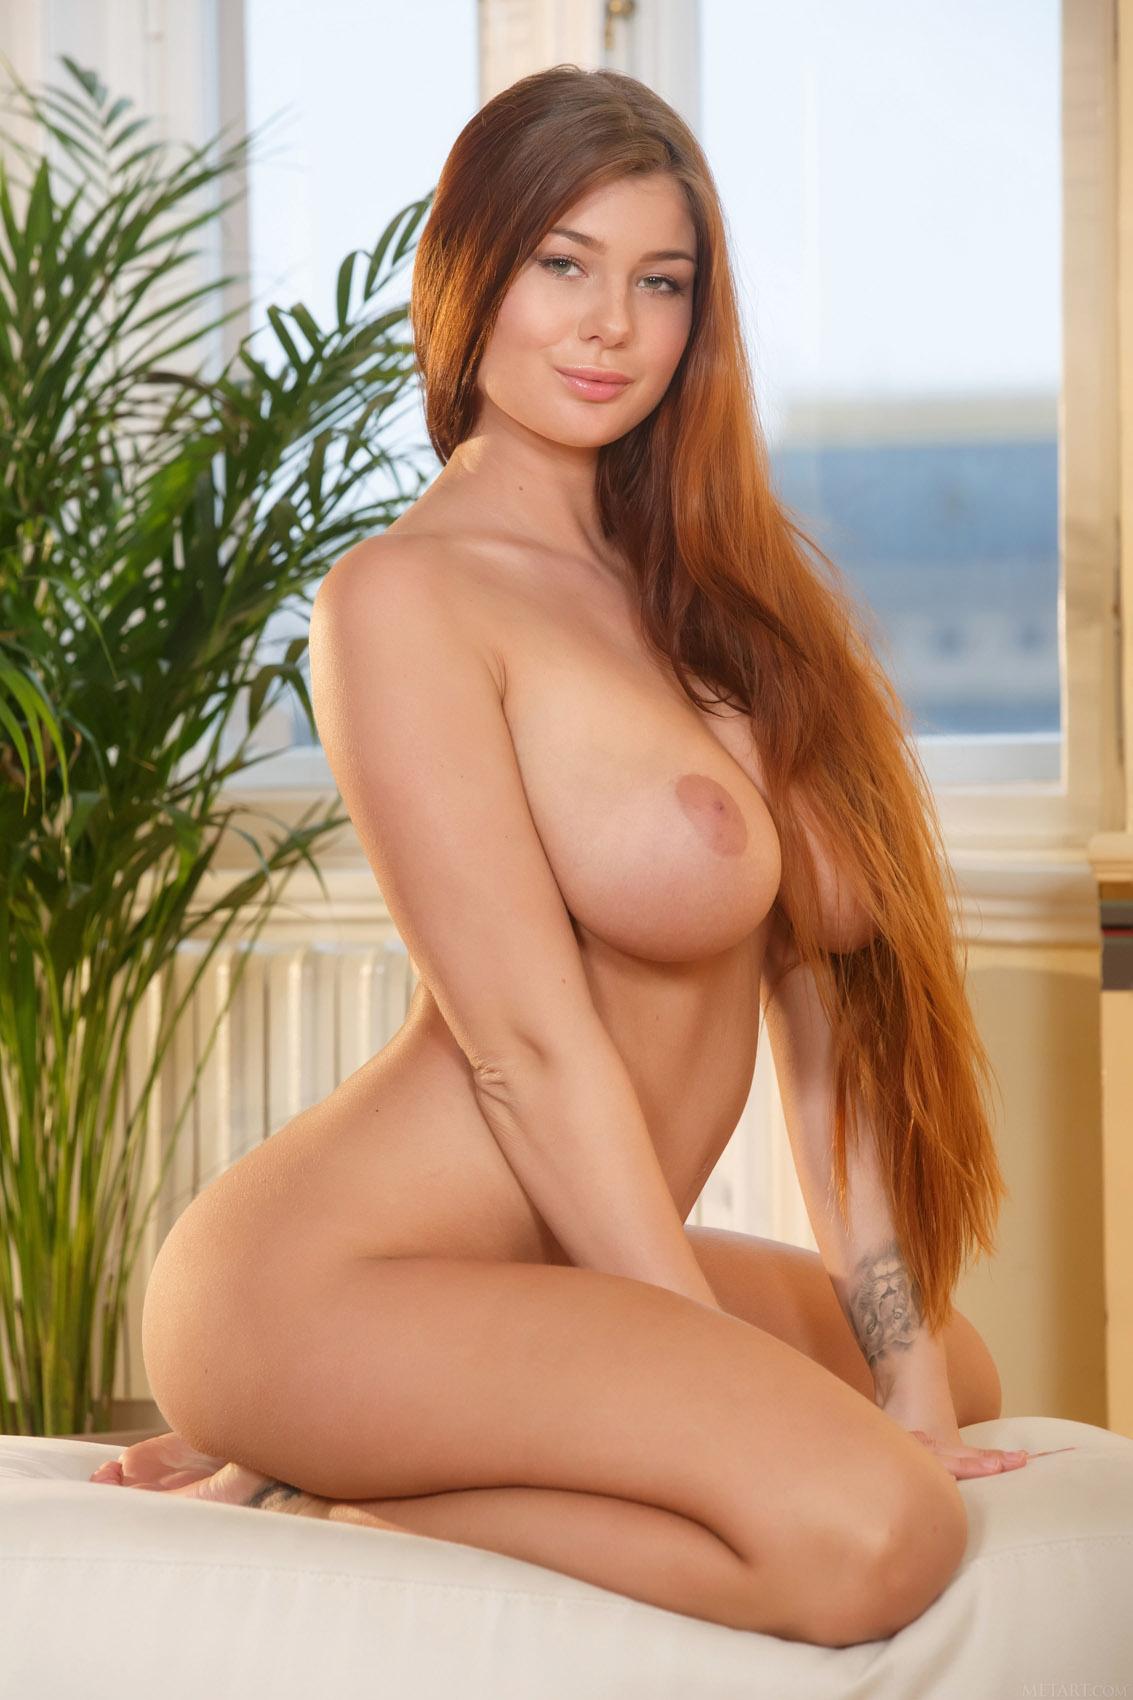 Long hair nude